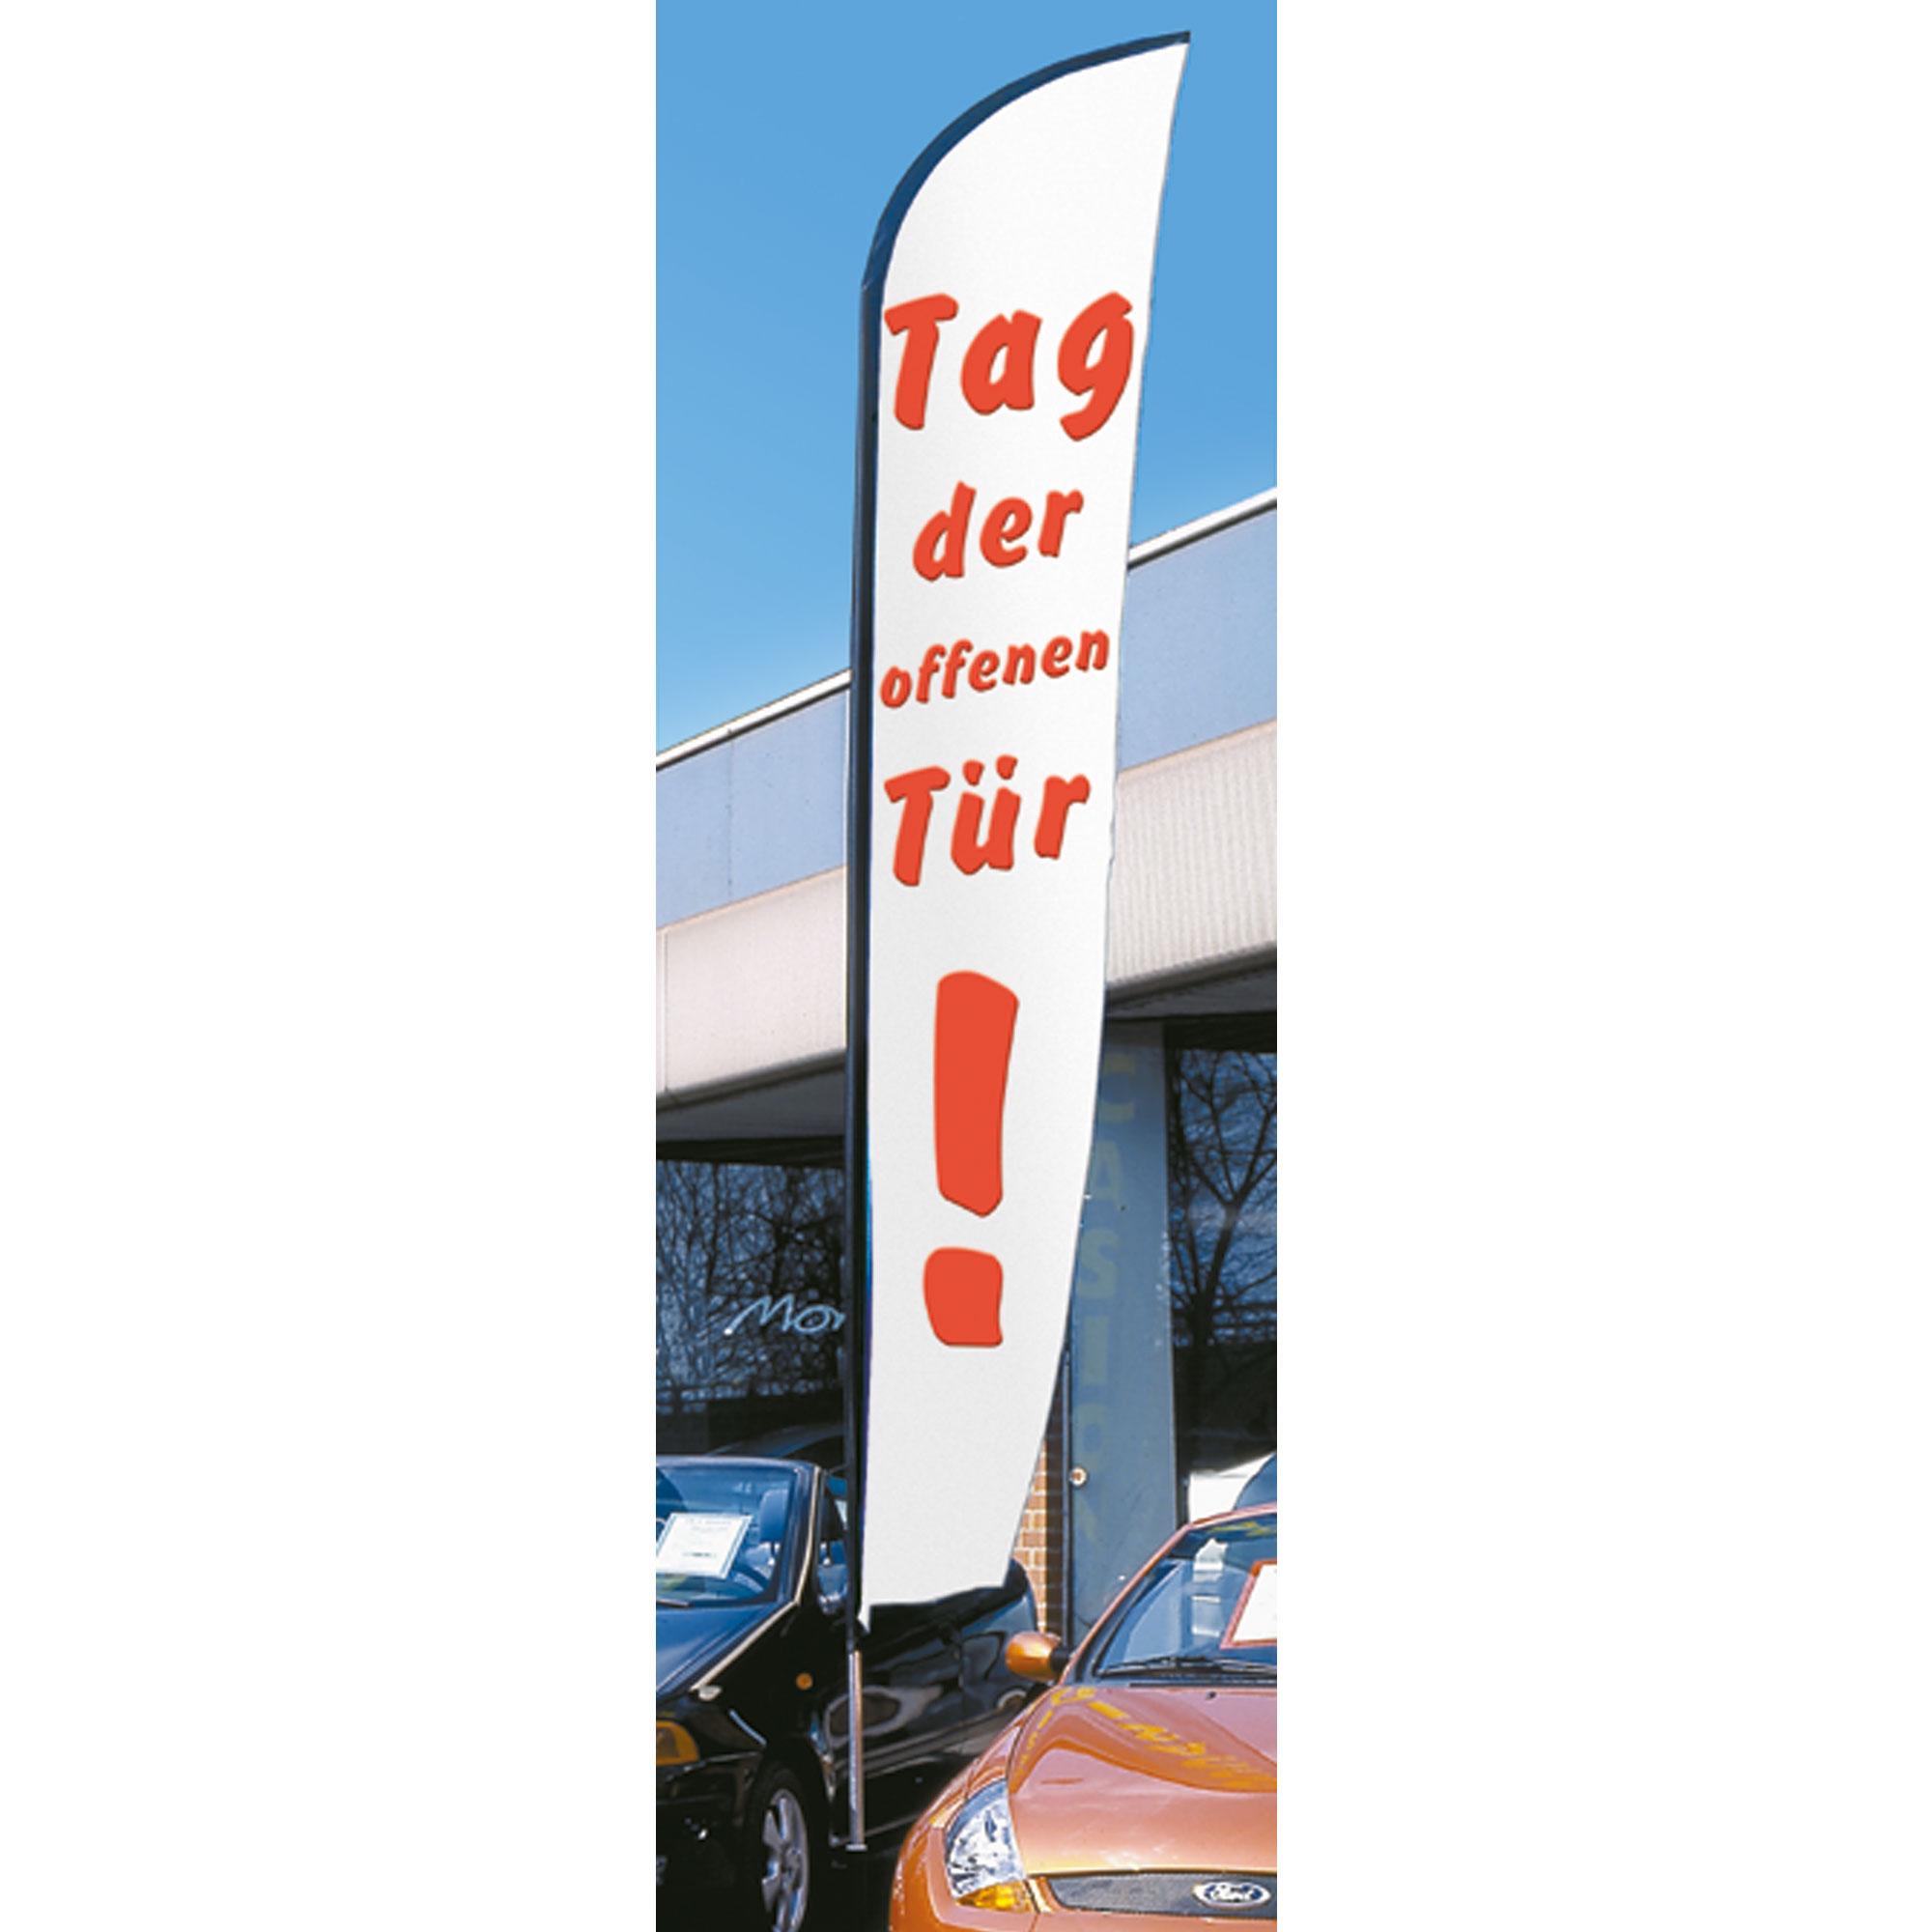 "Flying Flag 5m, ""Tag der offenen Tür"""